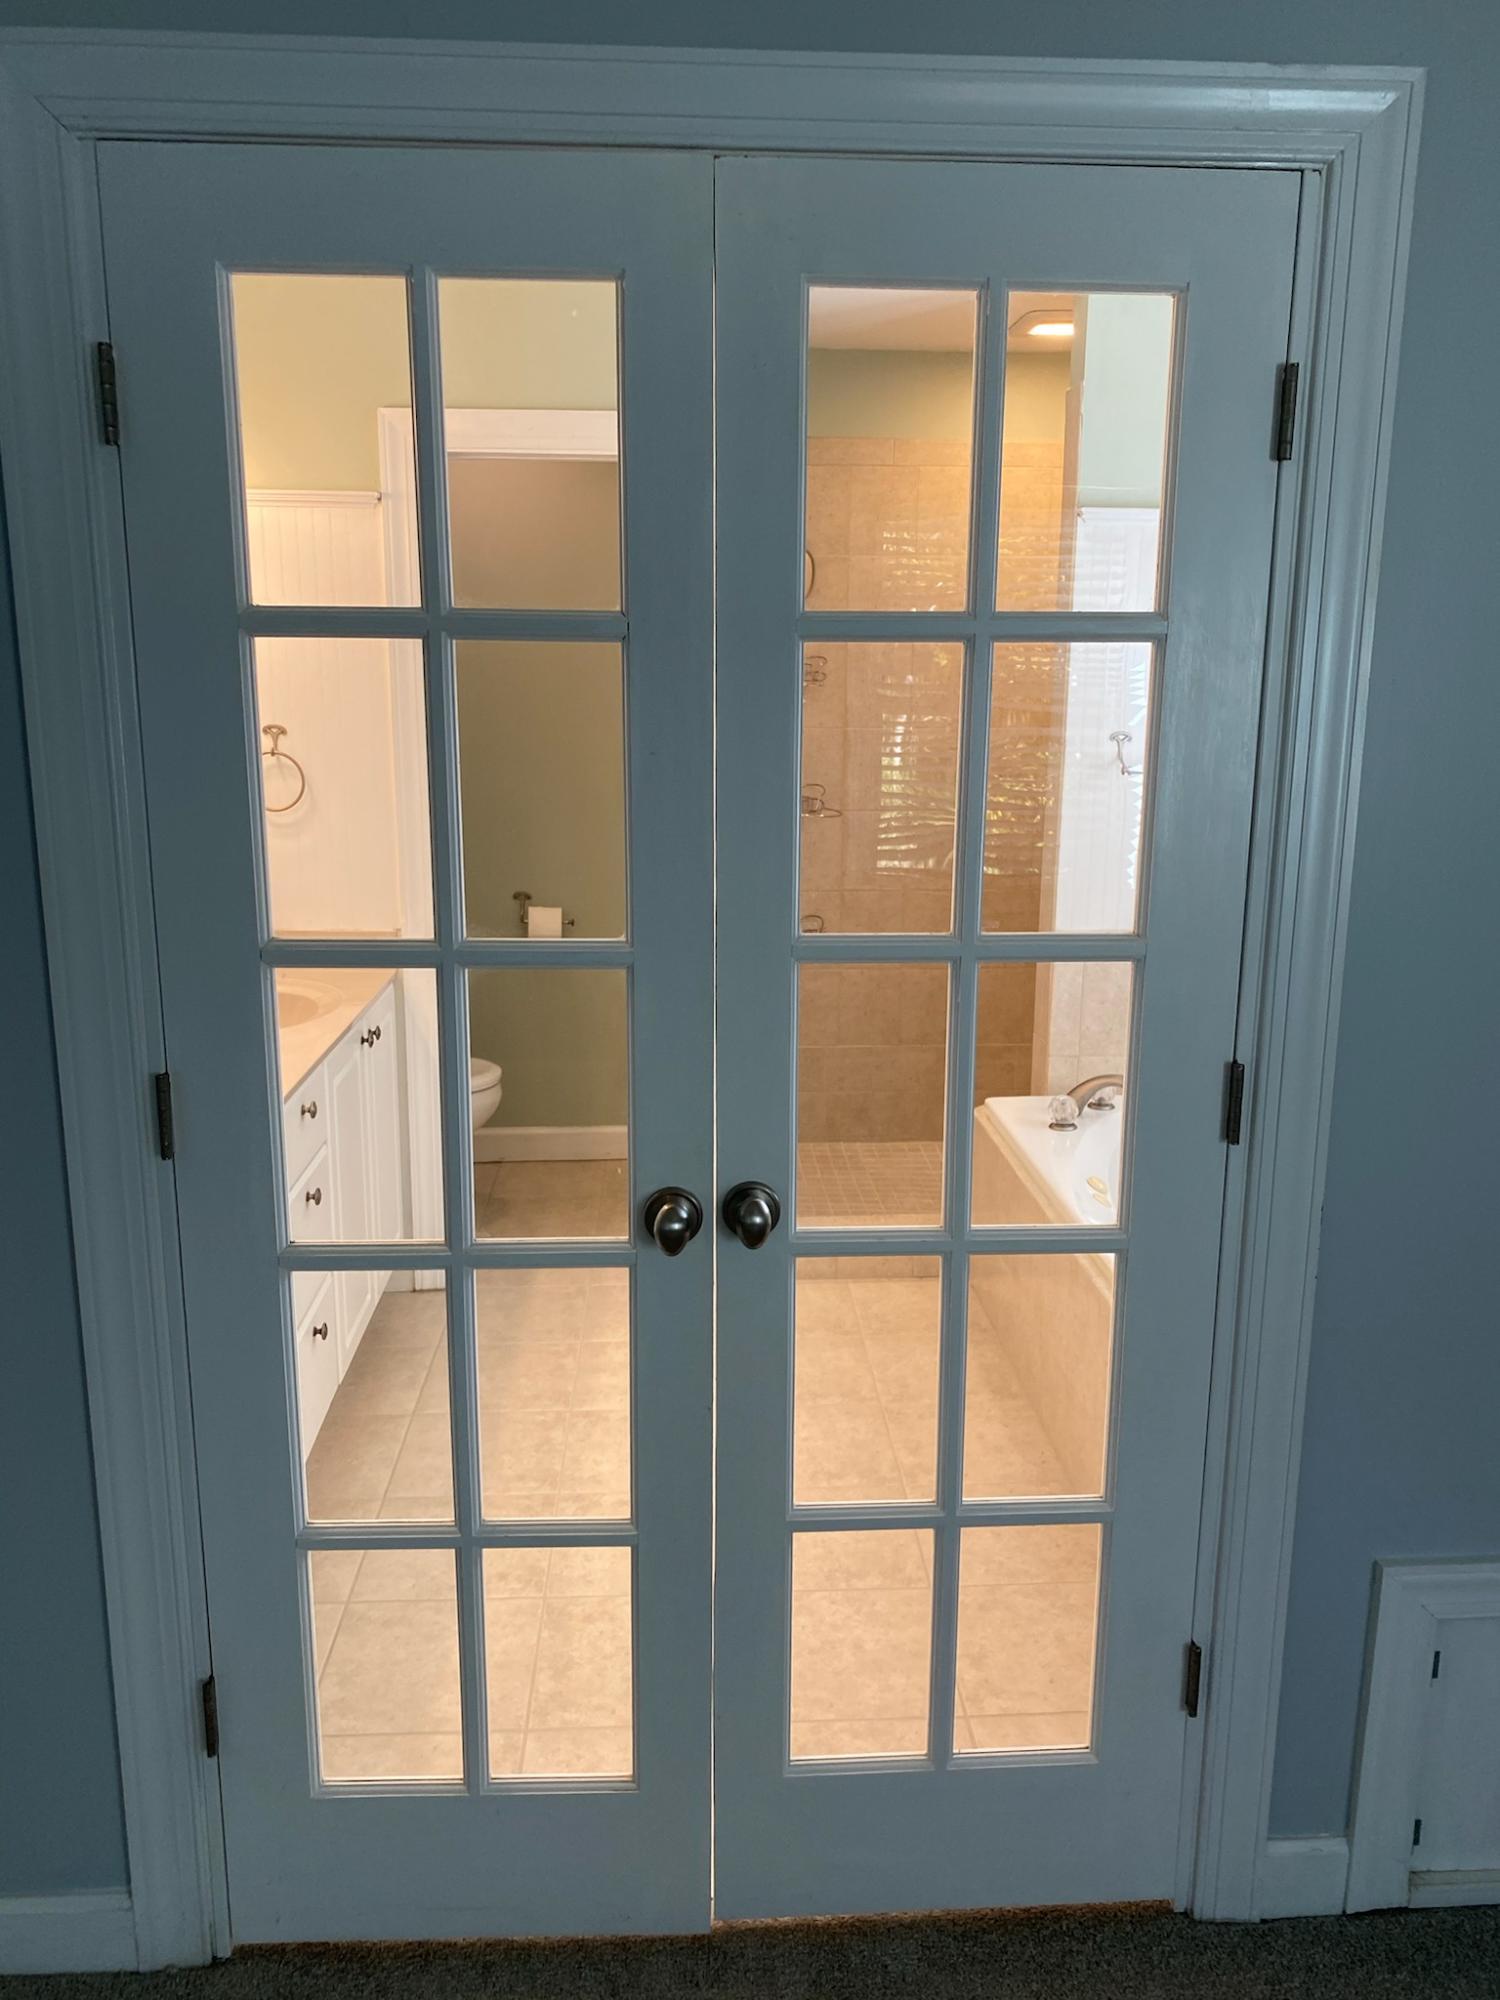 Laurel Lakes Homes For Sale - 1305 Woodlock, Mount Pleasant, SC - 17